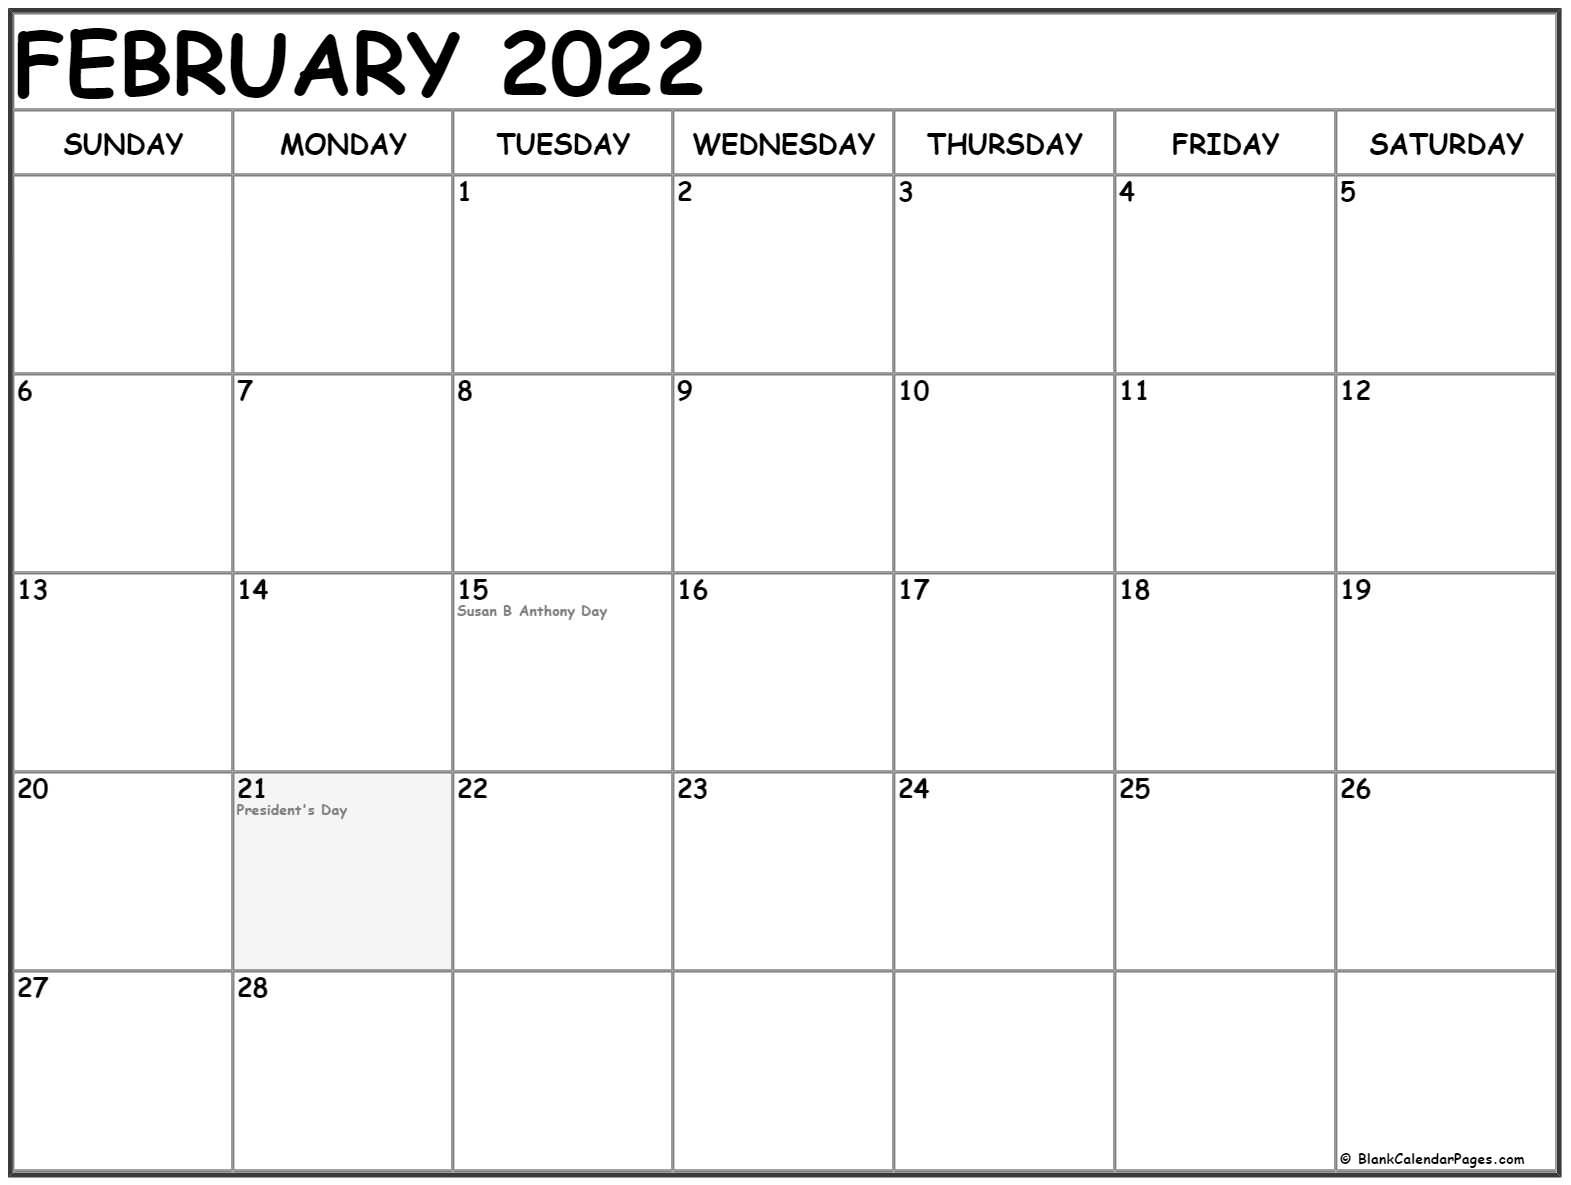 February 2022 Calendar With Holidays Pertaining To Feb 2022 Calendar Printable Free